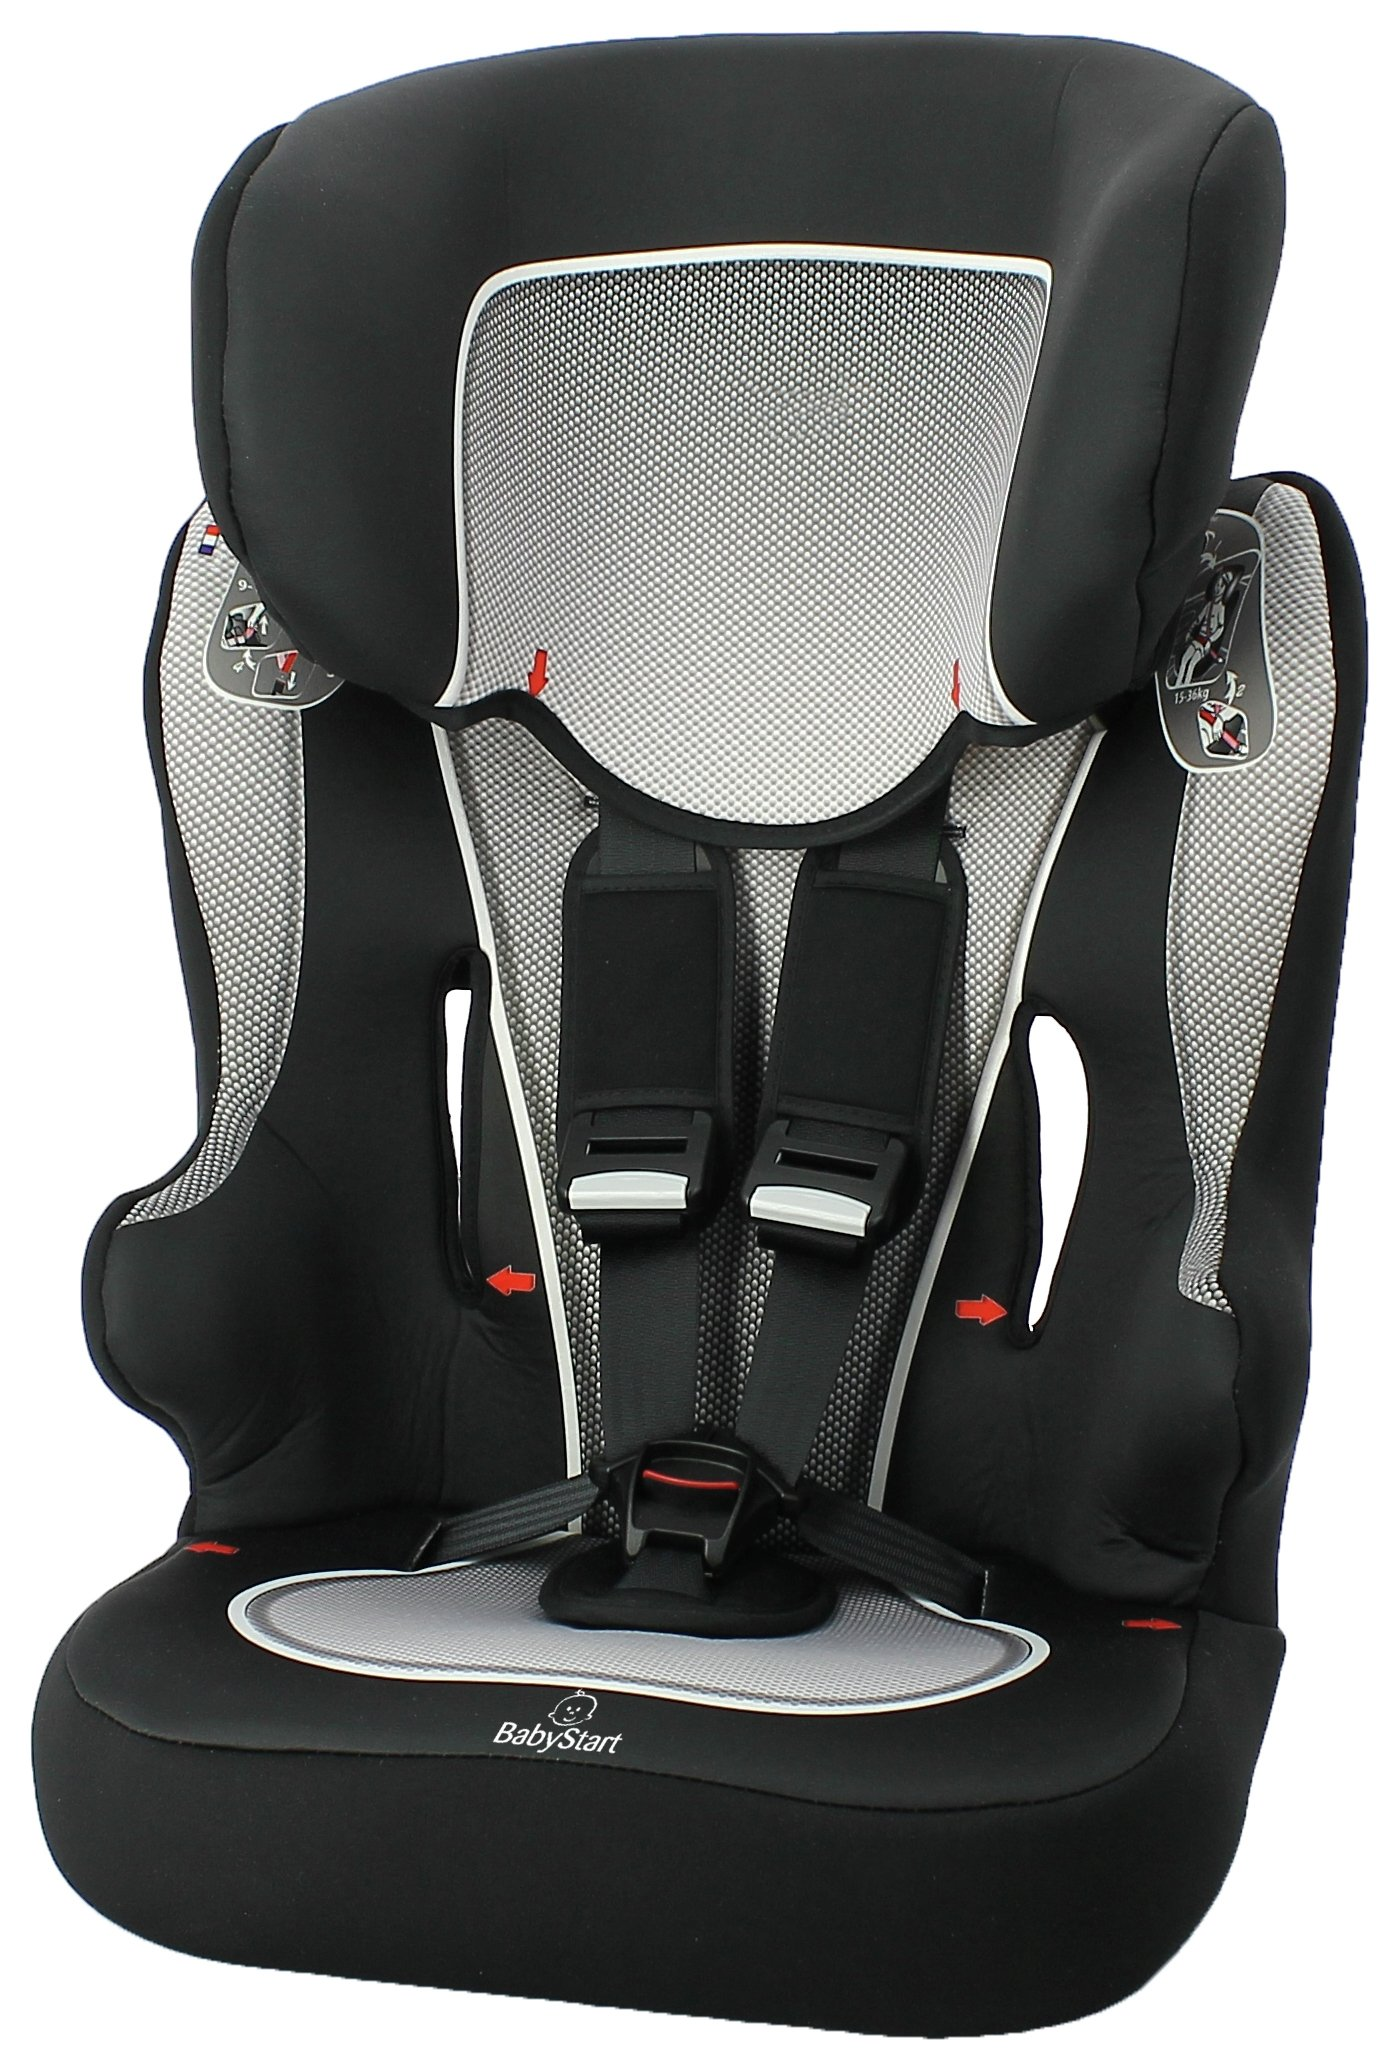 babystart-racer-group-1-2-3-black-grey-car-seat